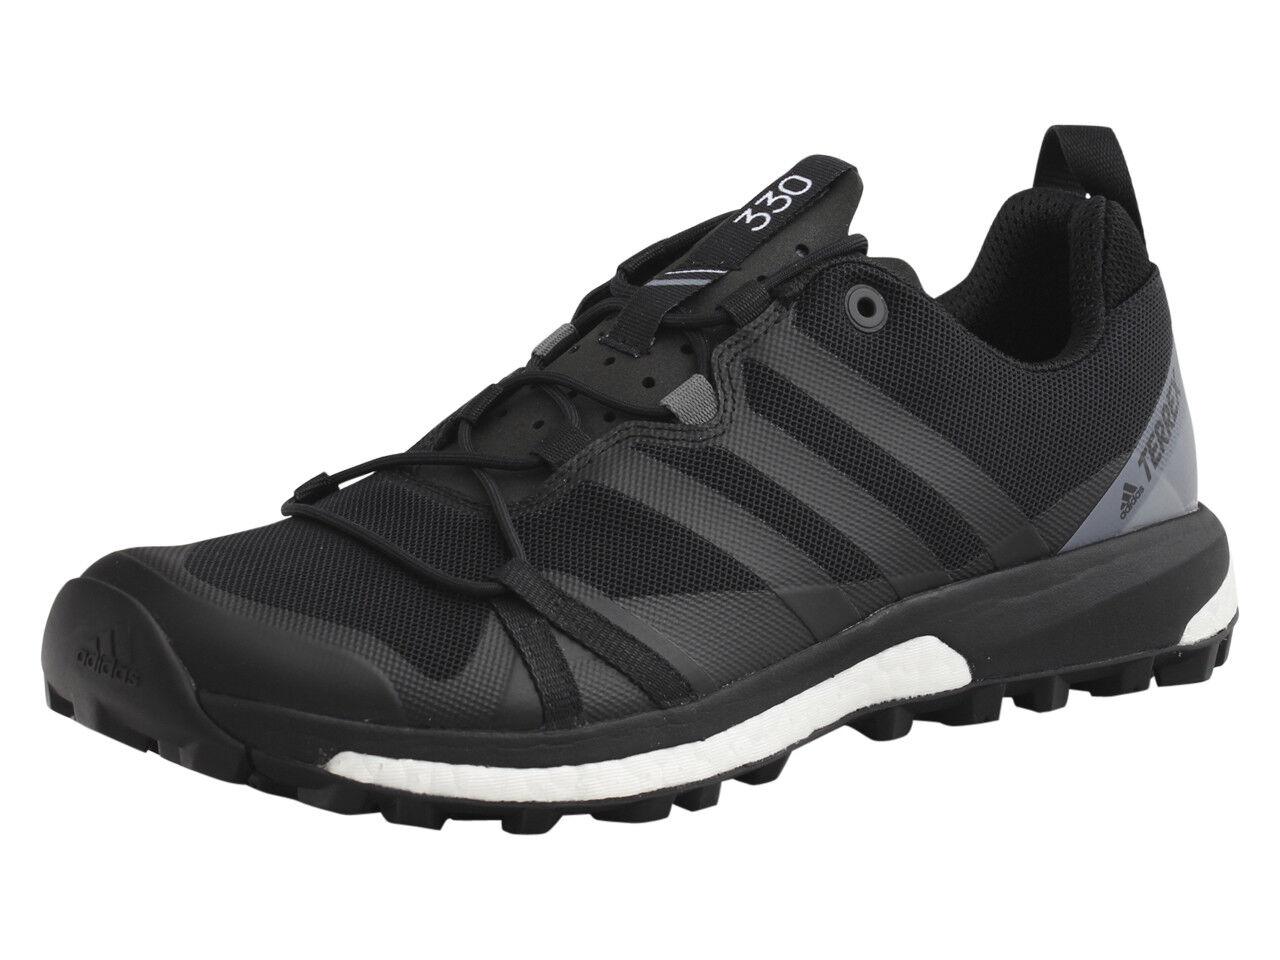 Adidas Terrex-Agravic Tutti i Terreni Trail Running schuhe da Tennis